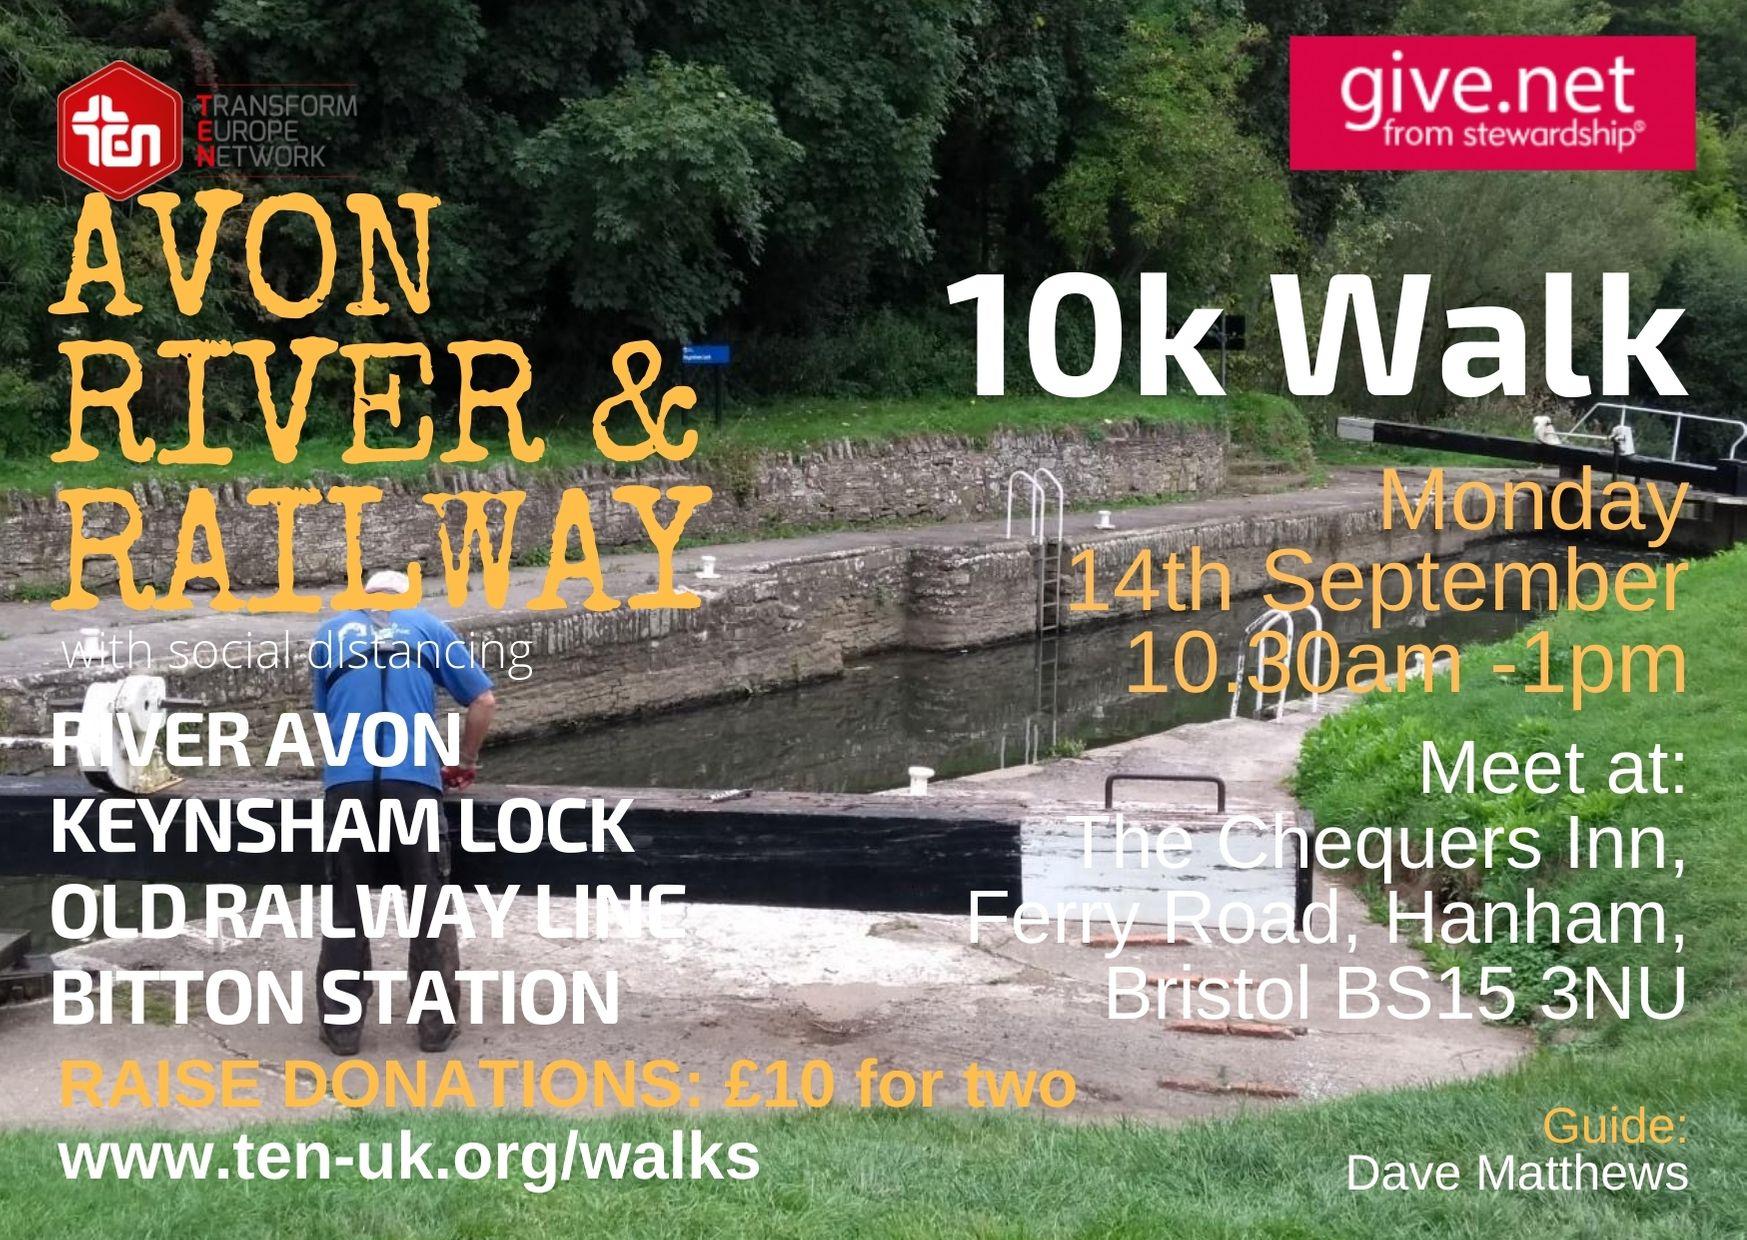 Avon River walk